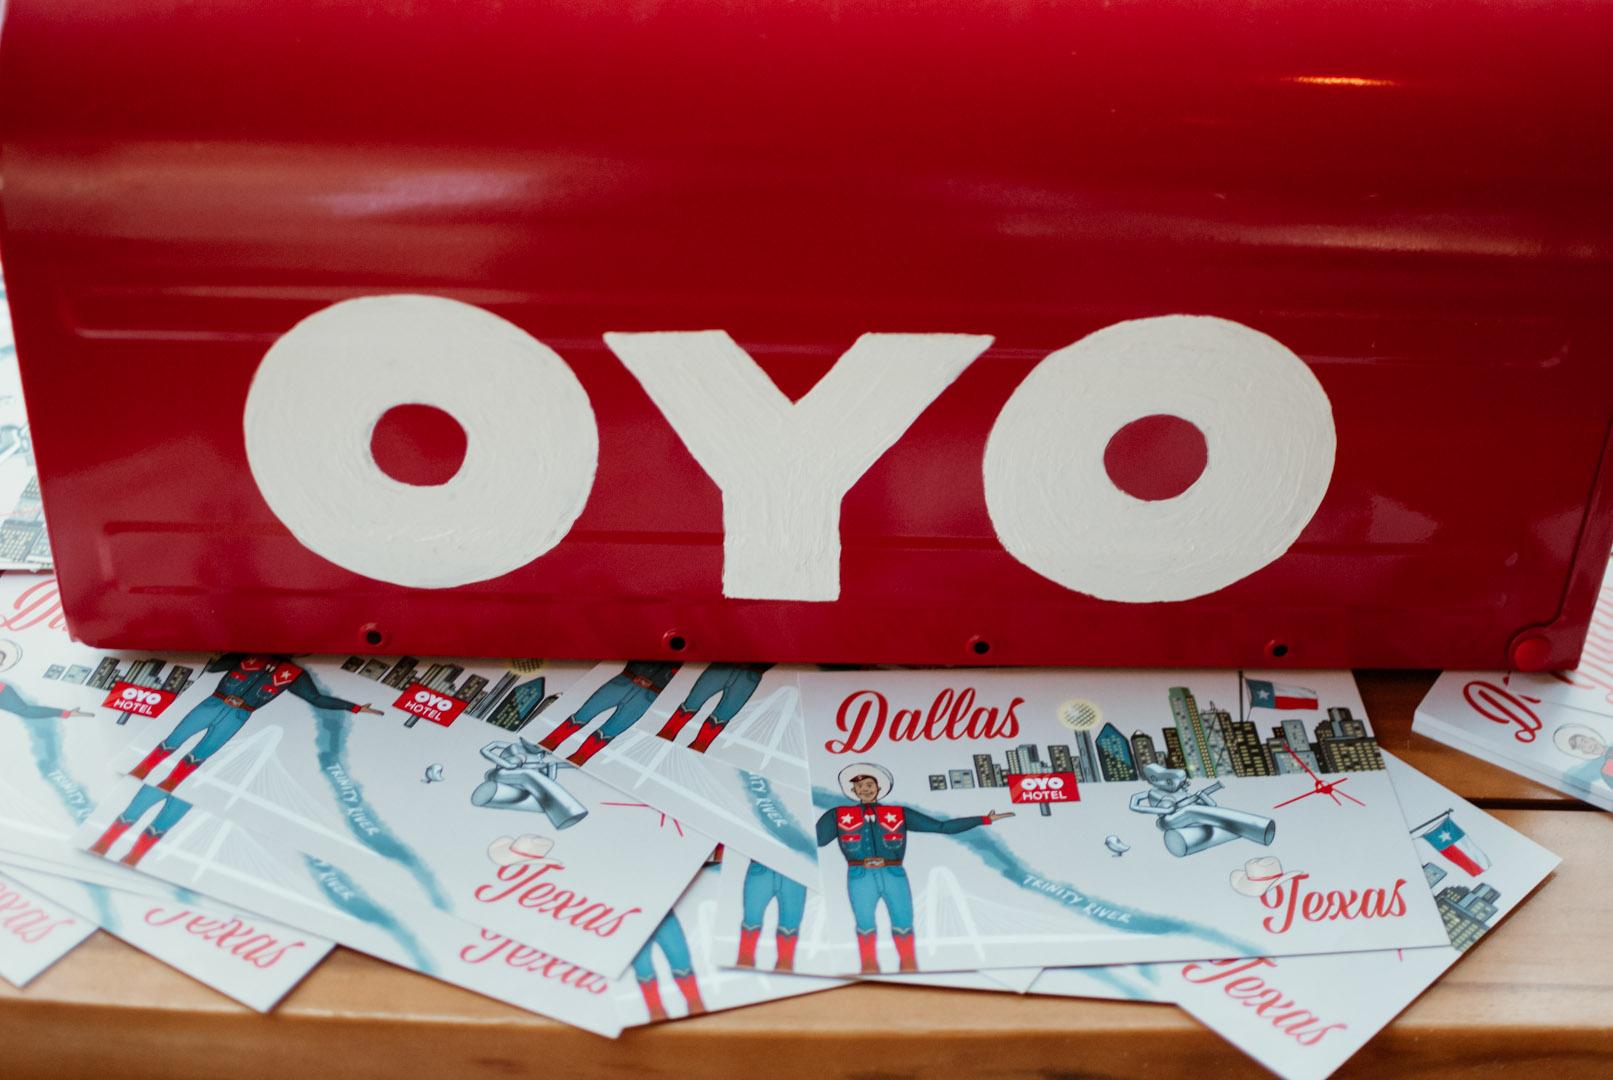 OYO-93.jpg